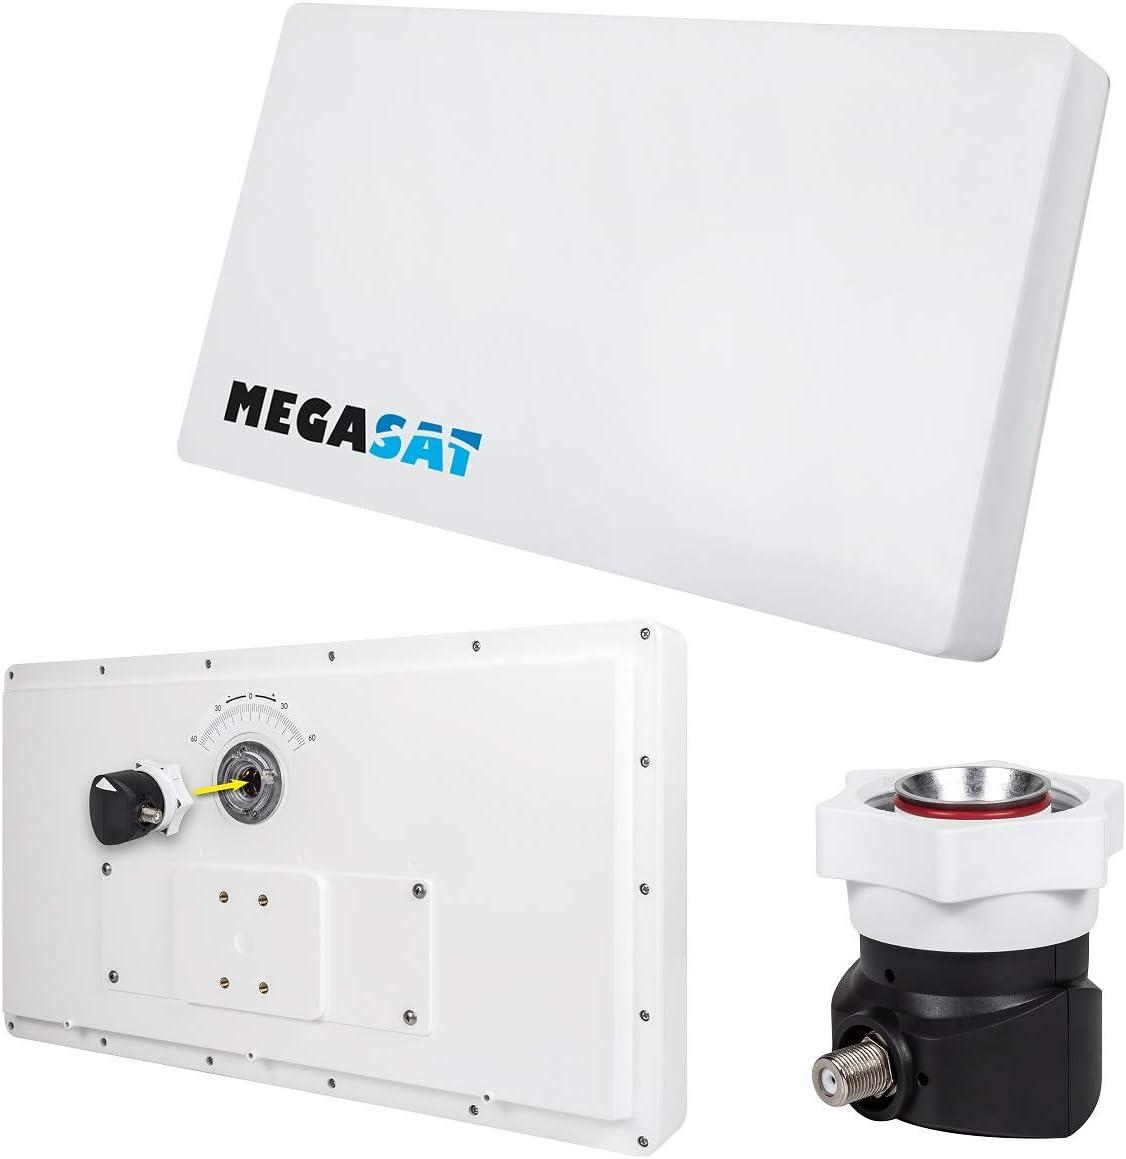 Megasat Antena Plana 200210 D1 Profi-Line – Color Blanco